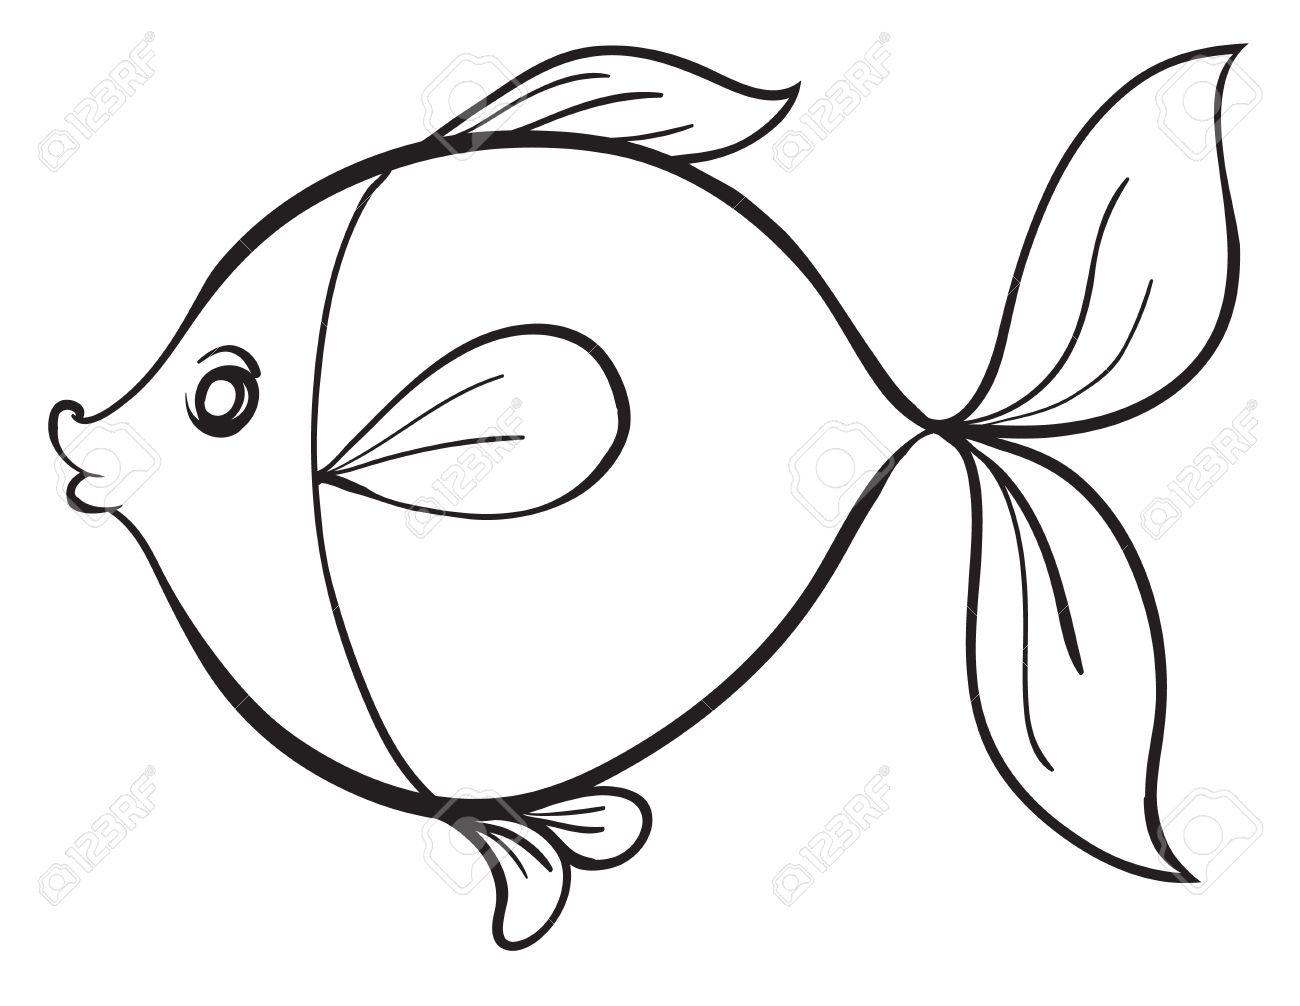 1300x1006 Fish Line Art Preschool Photos Of Pretty Fish Line Art 10 17669